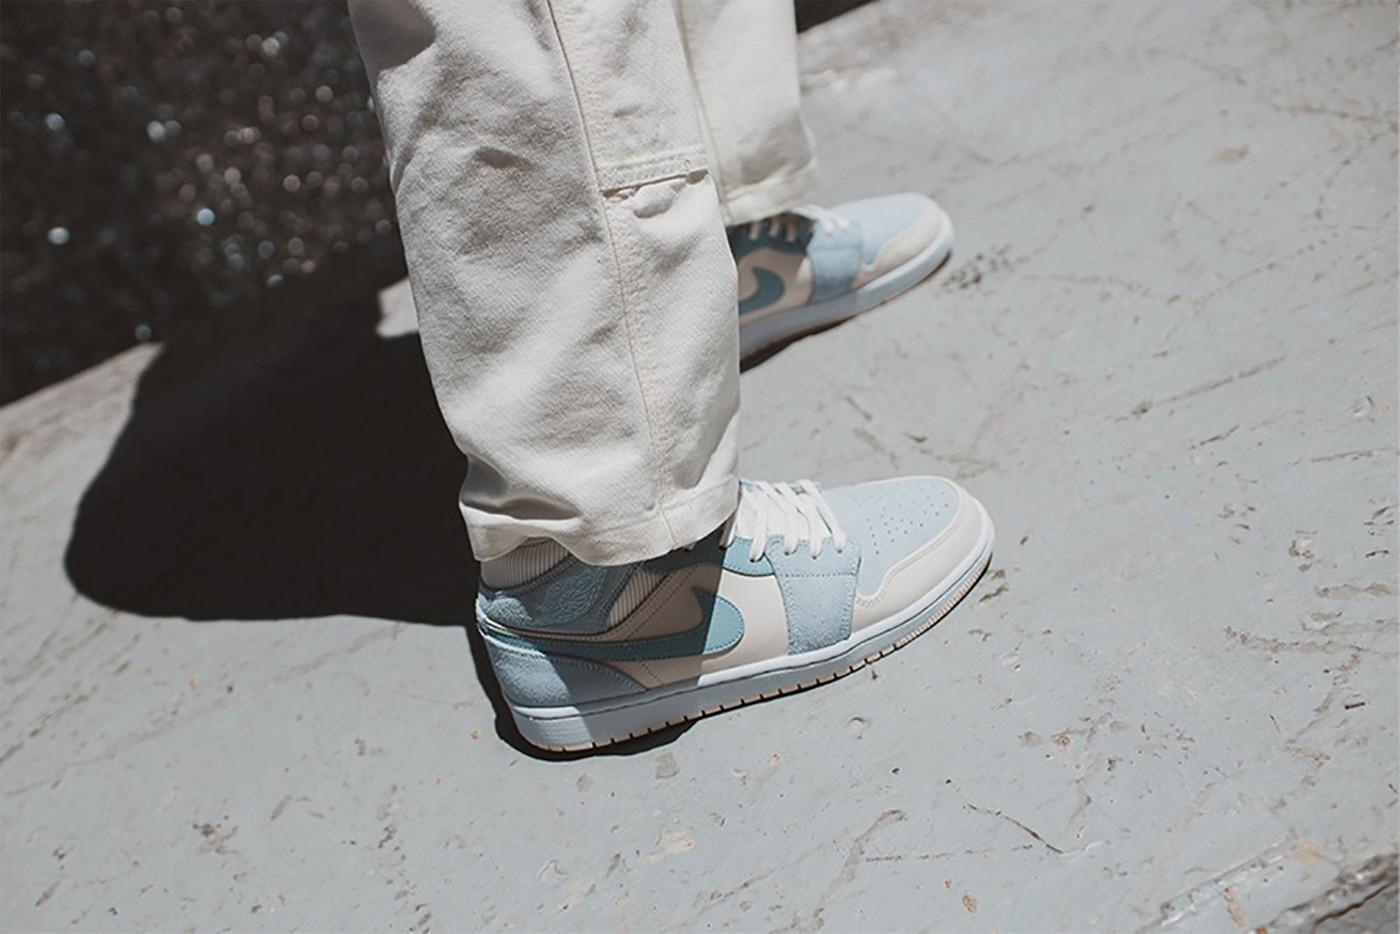 nike air Jordan 1 mid se sneakers pastel blue yellow white grey colorway raffle release info